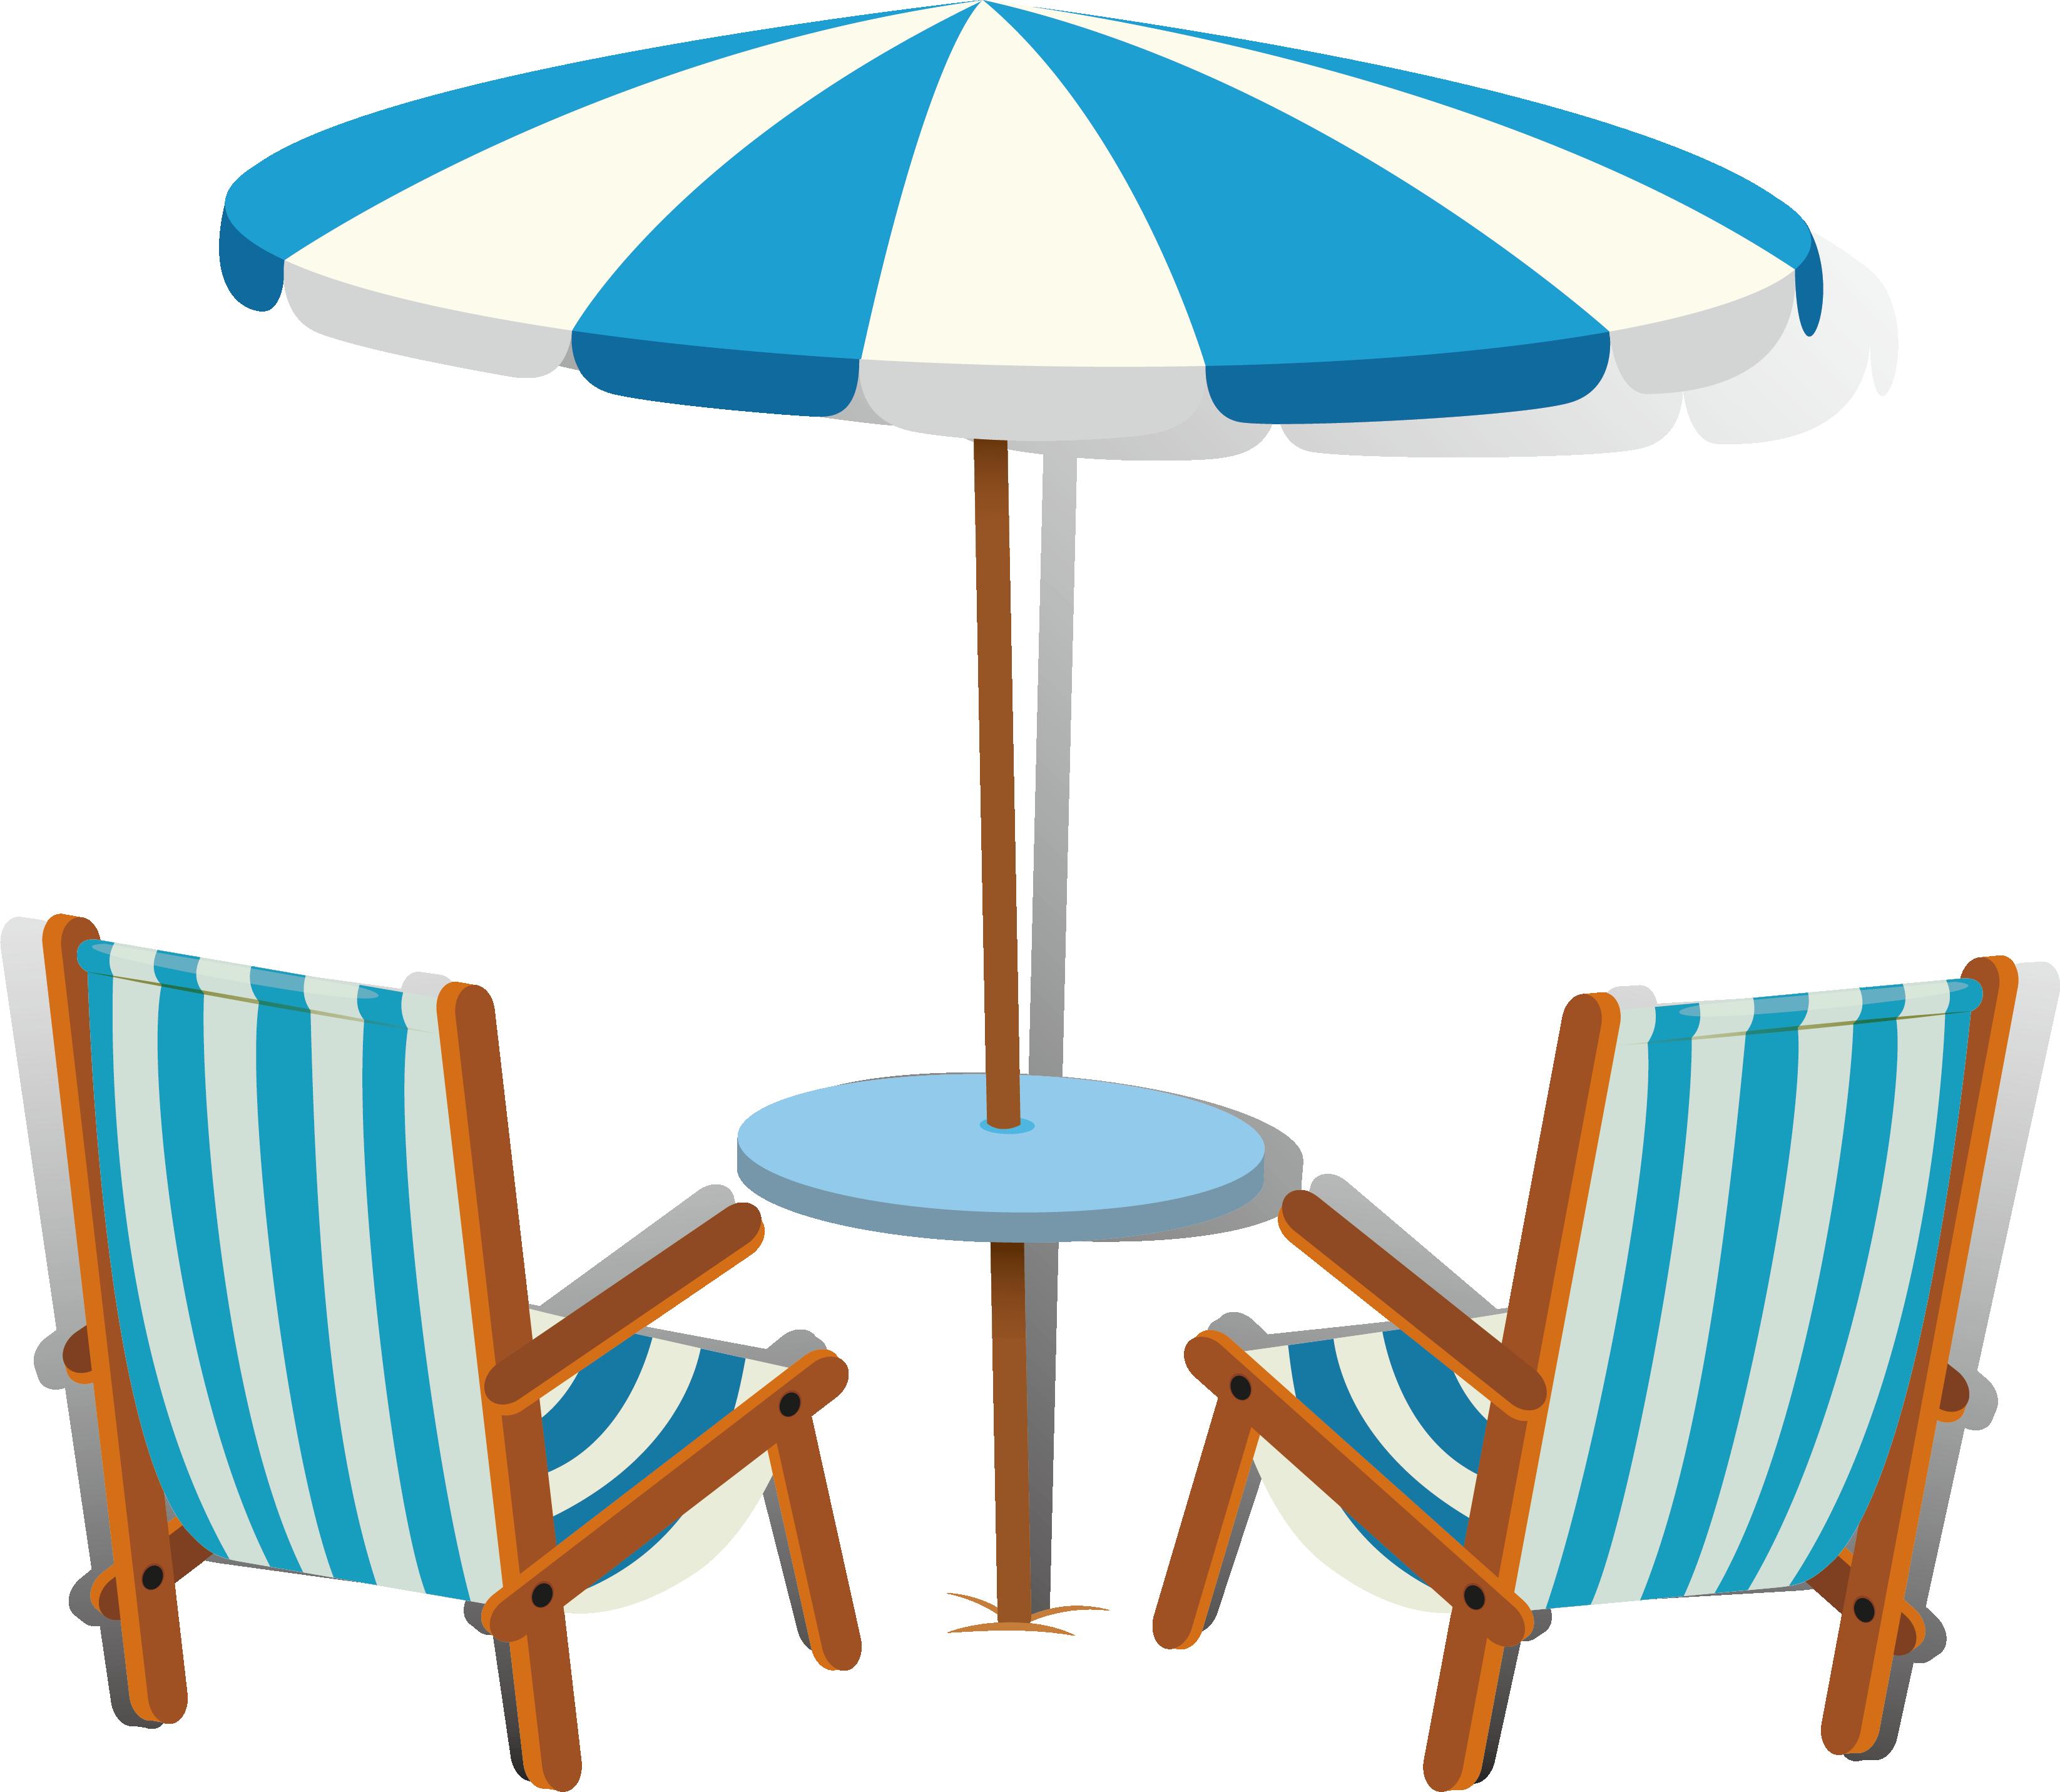 Clipart umbrella striped umbrella. Euclidean vector chair beach